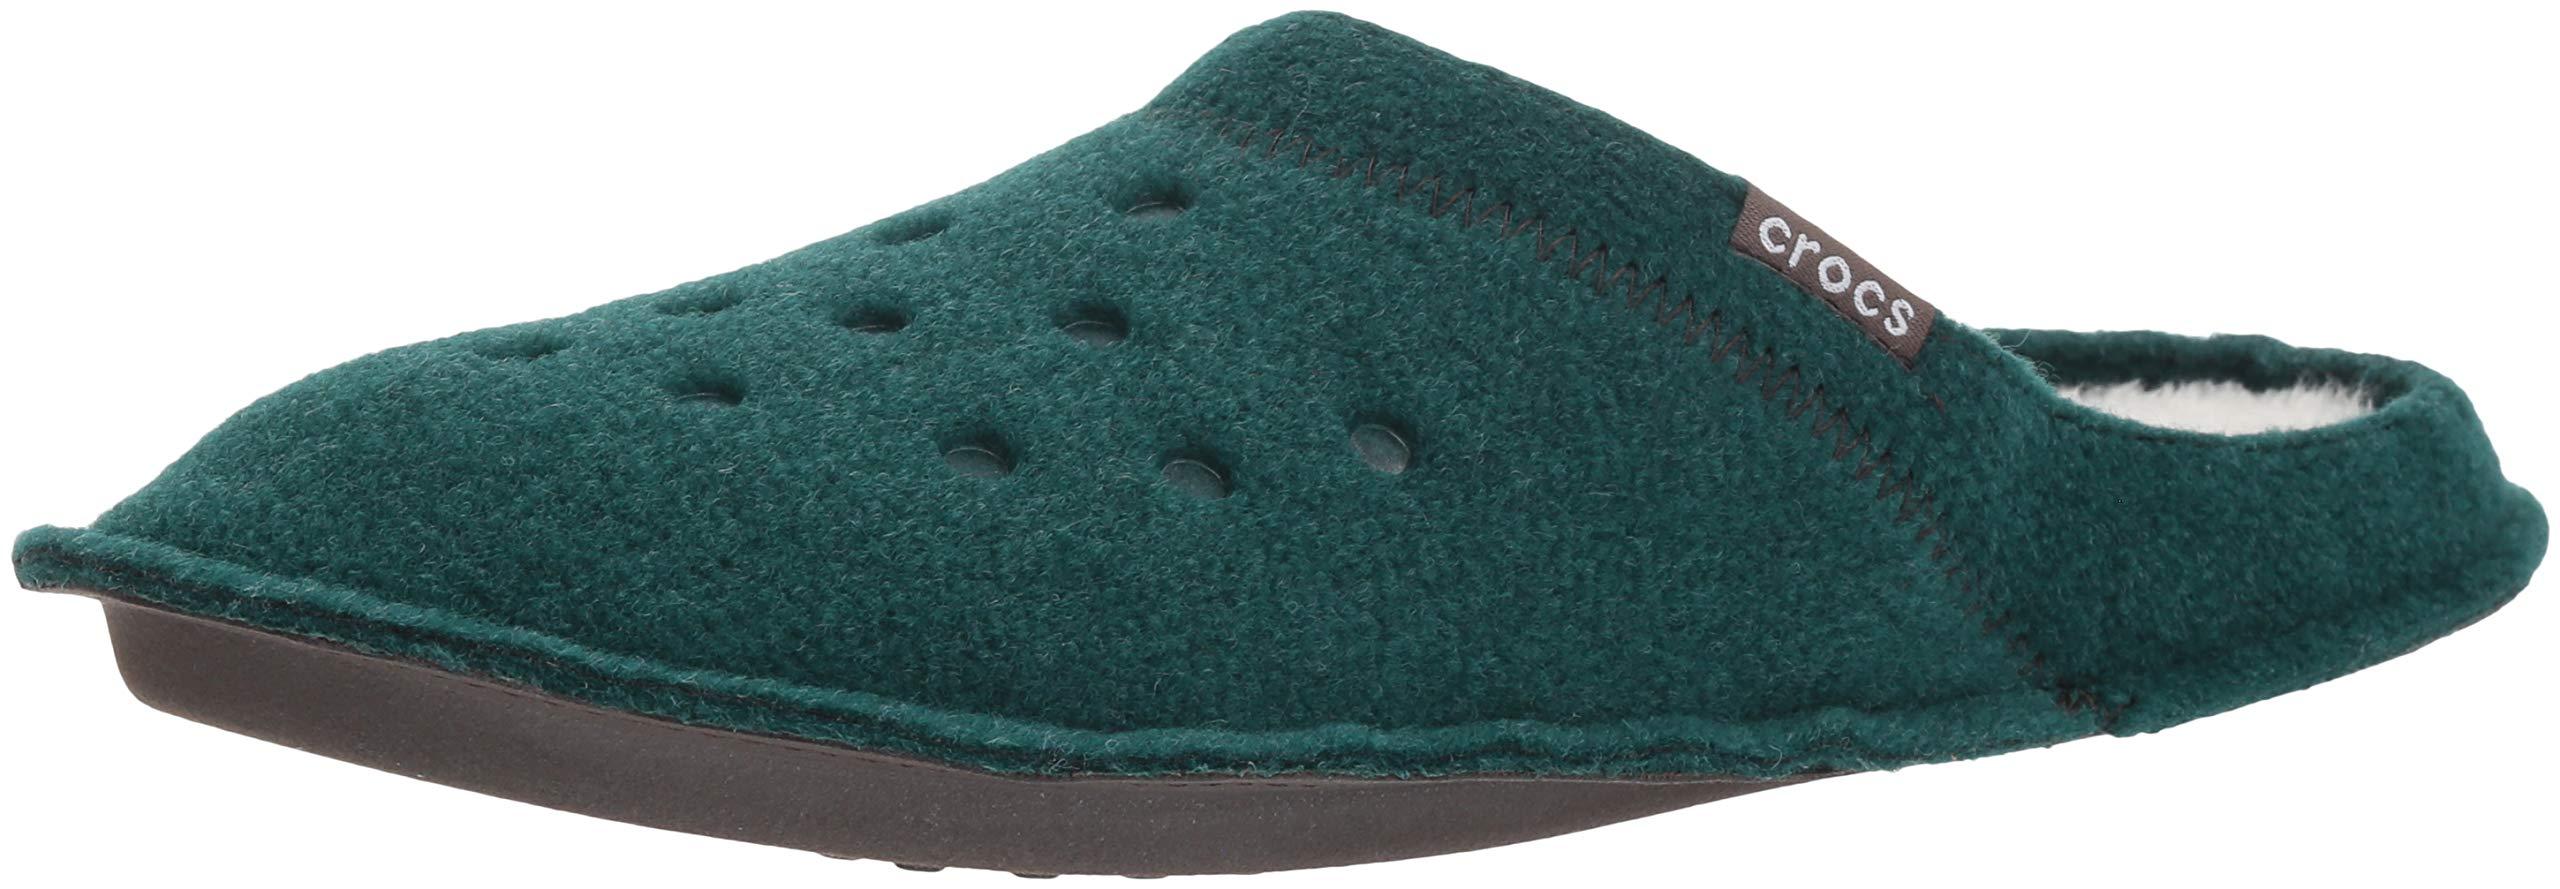 Crocs Classic Slipper, Evergreen/Stucco, 13 US Men / 15 US Women